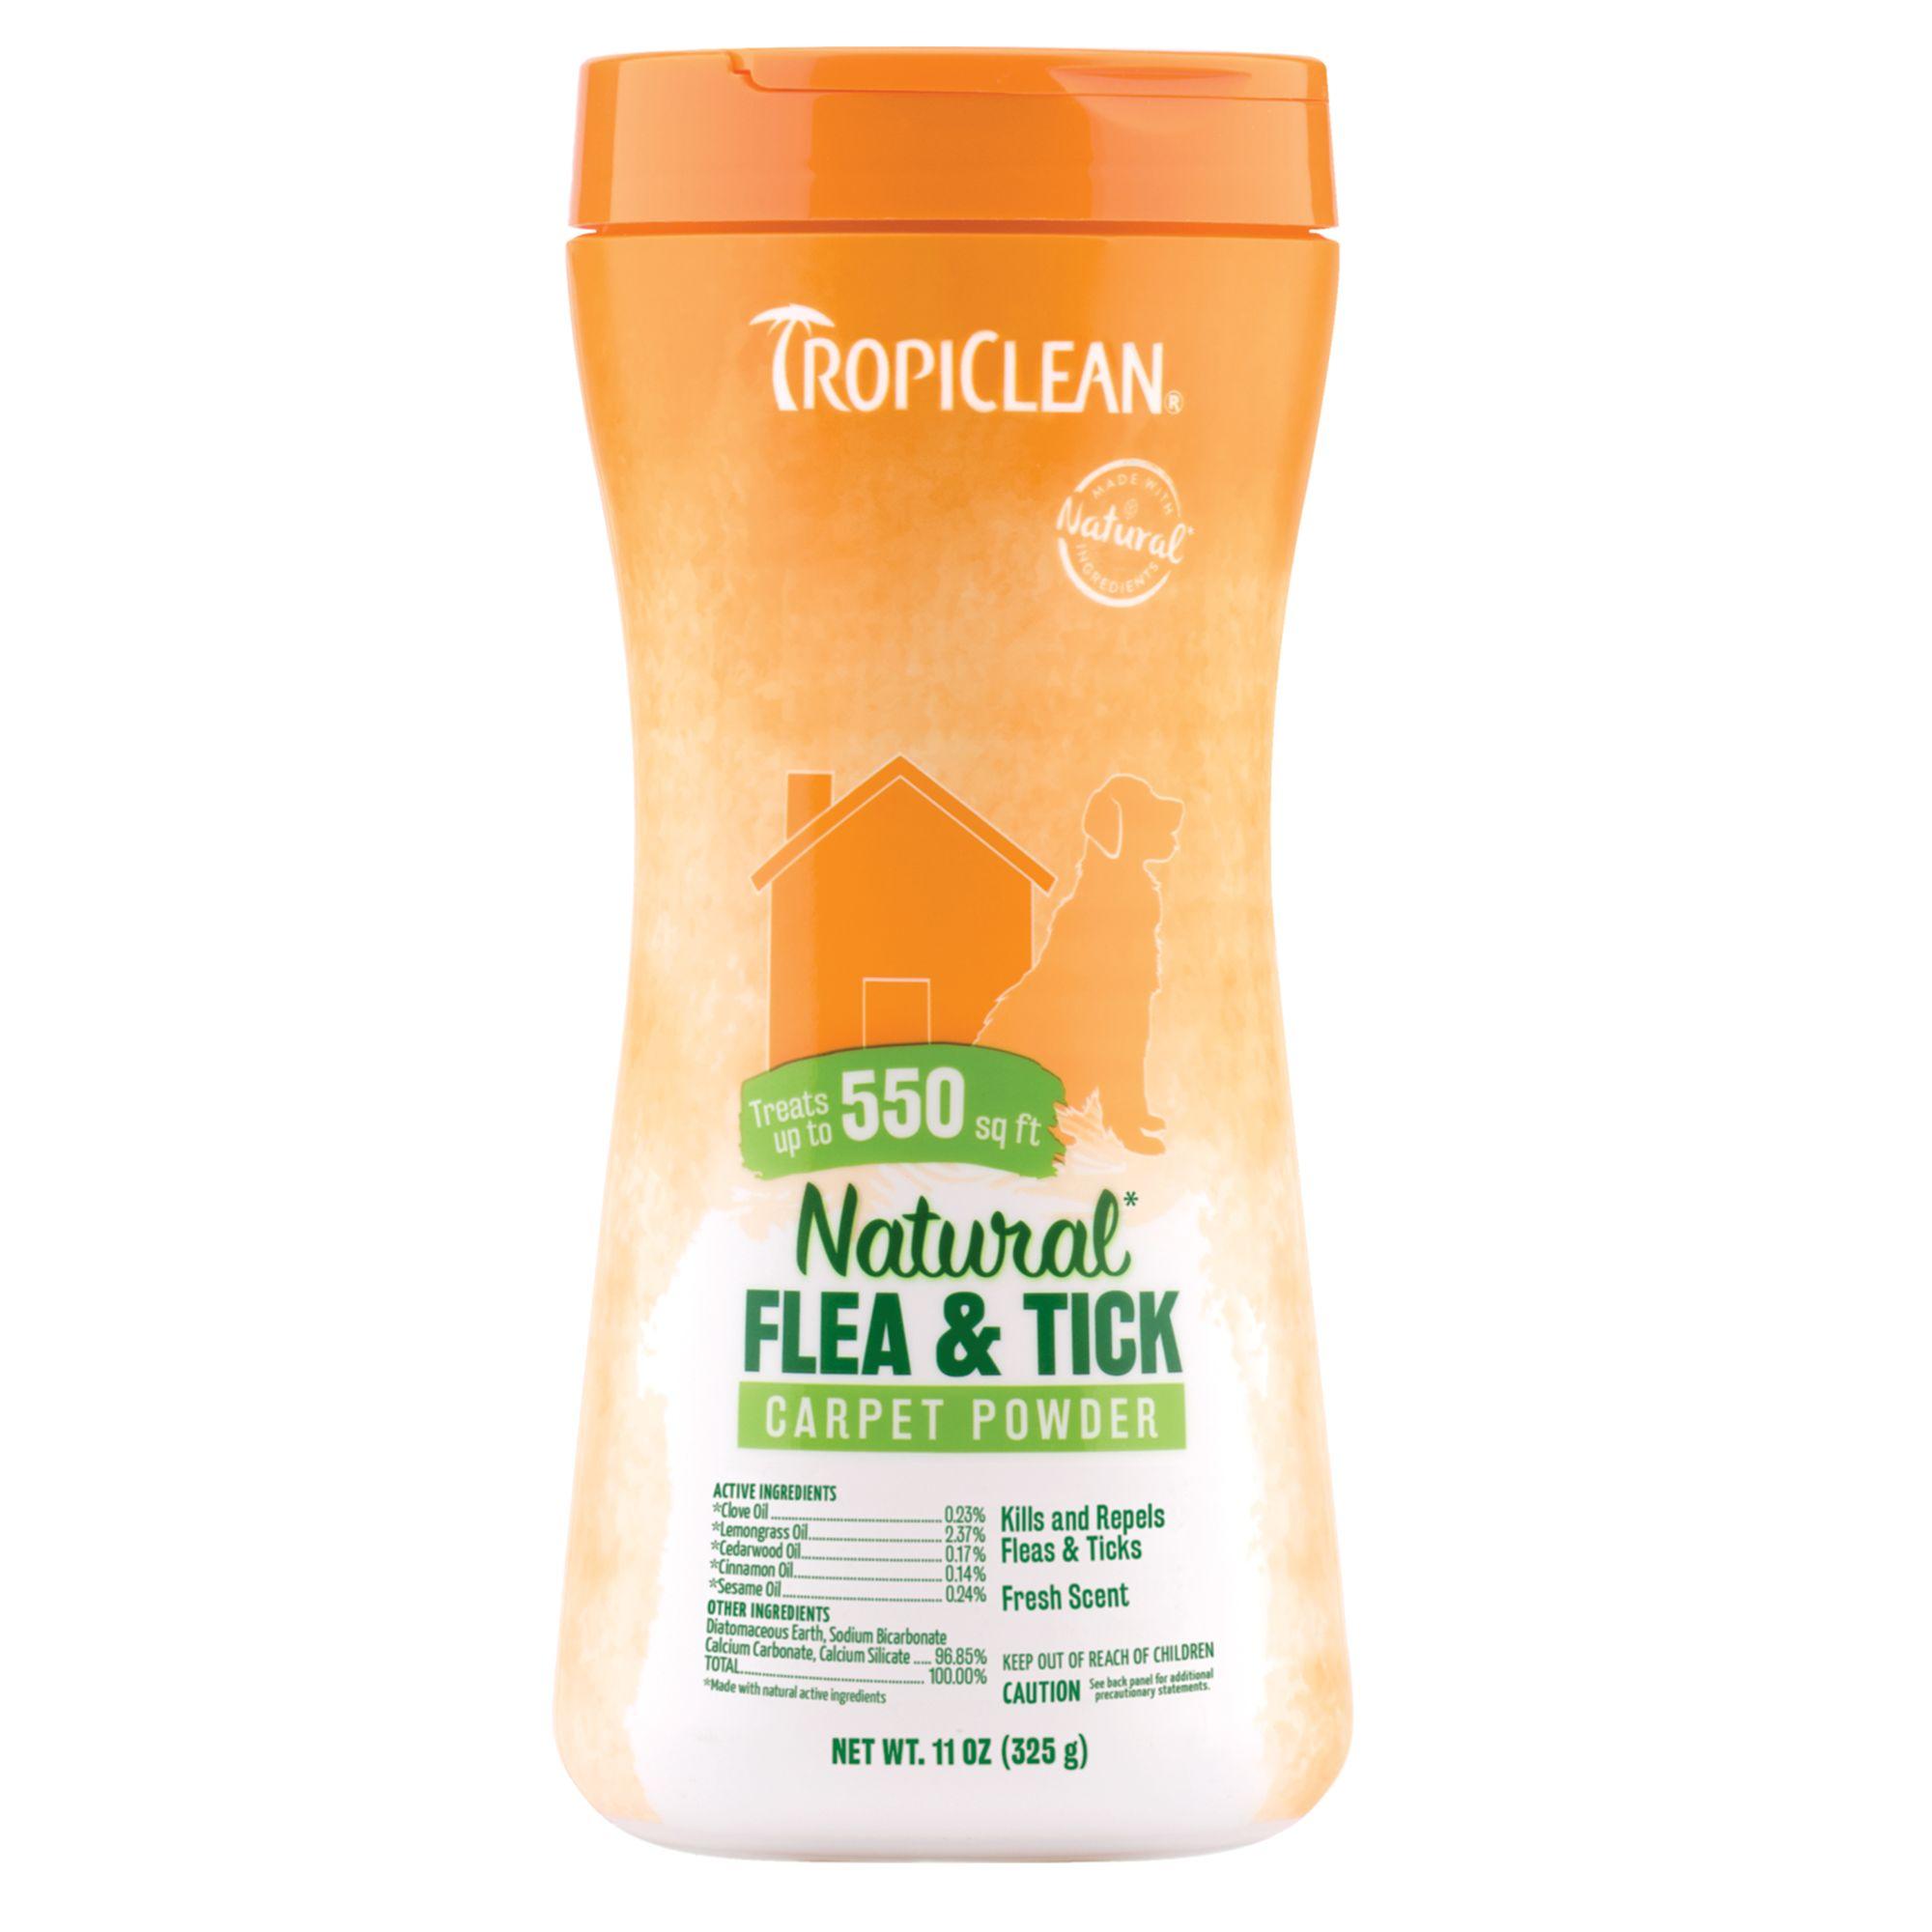 Tropiclean Natural Flea Tick Carpet Powder